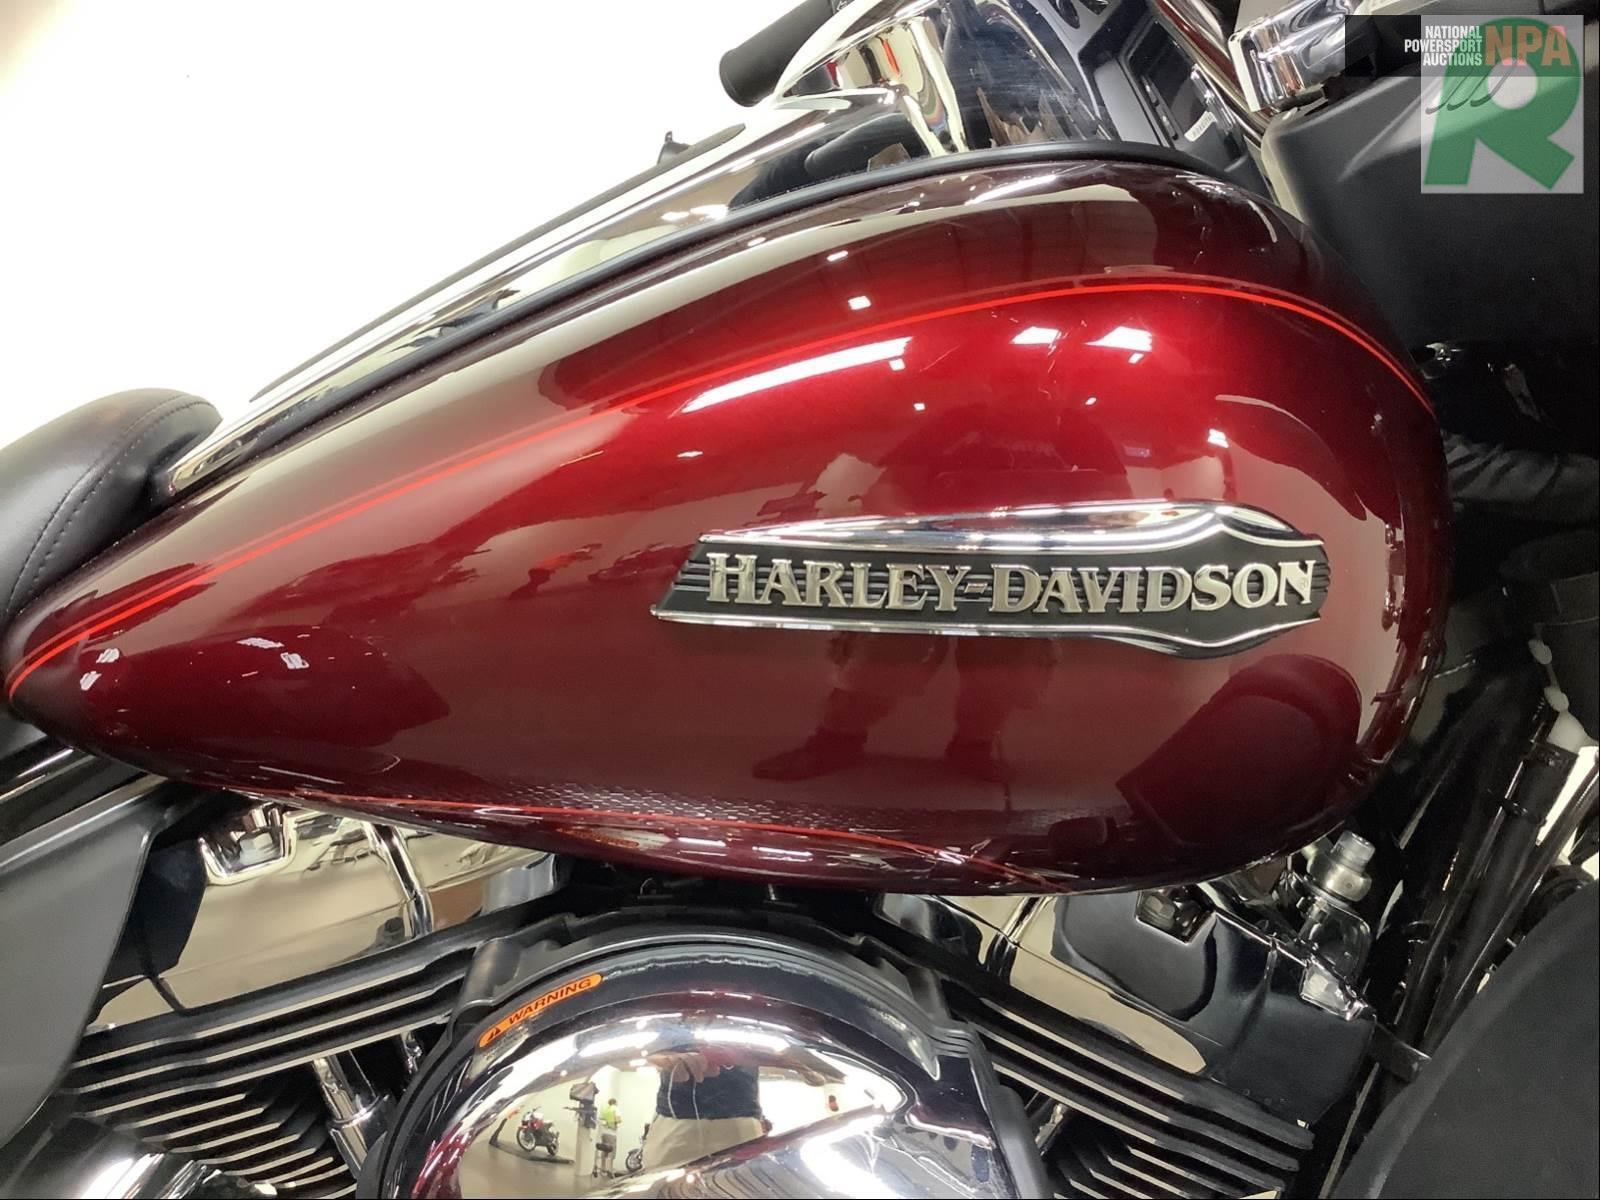 2015 HARLEY-DAVIDSON FLHTCUTG TRIGLIDE ULTRA CLASSIC